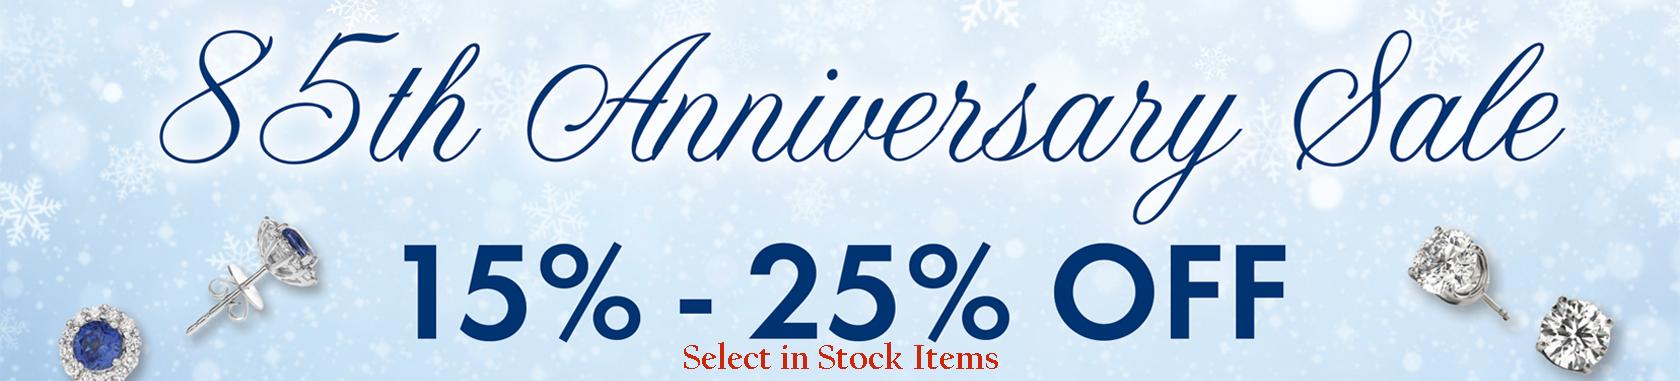 85th-Anniversary-Sale-Web-banner